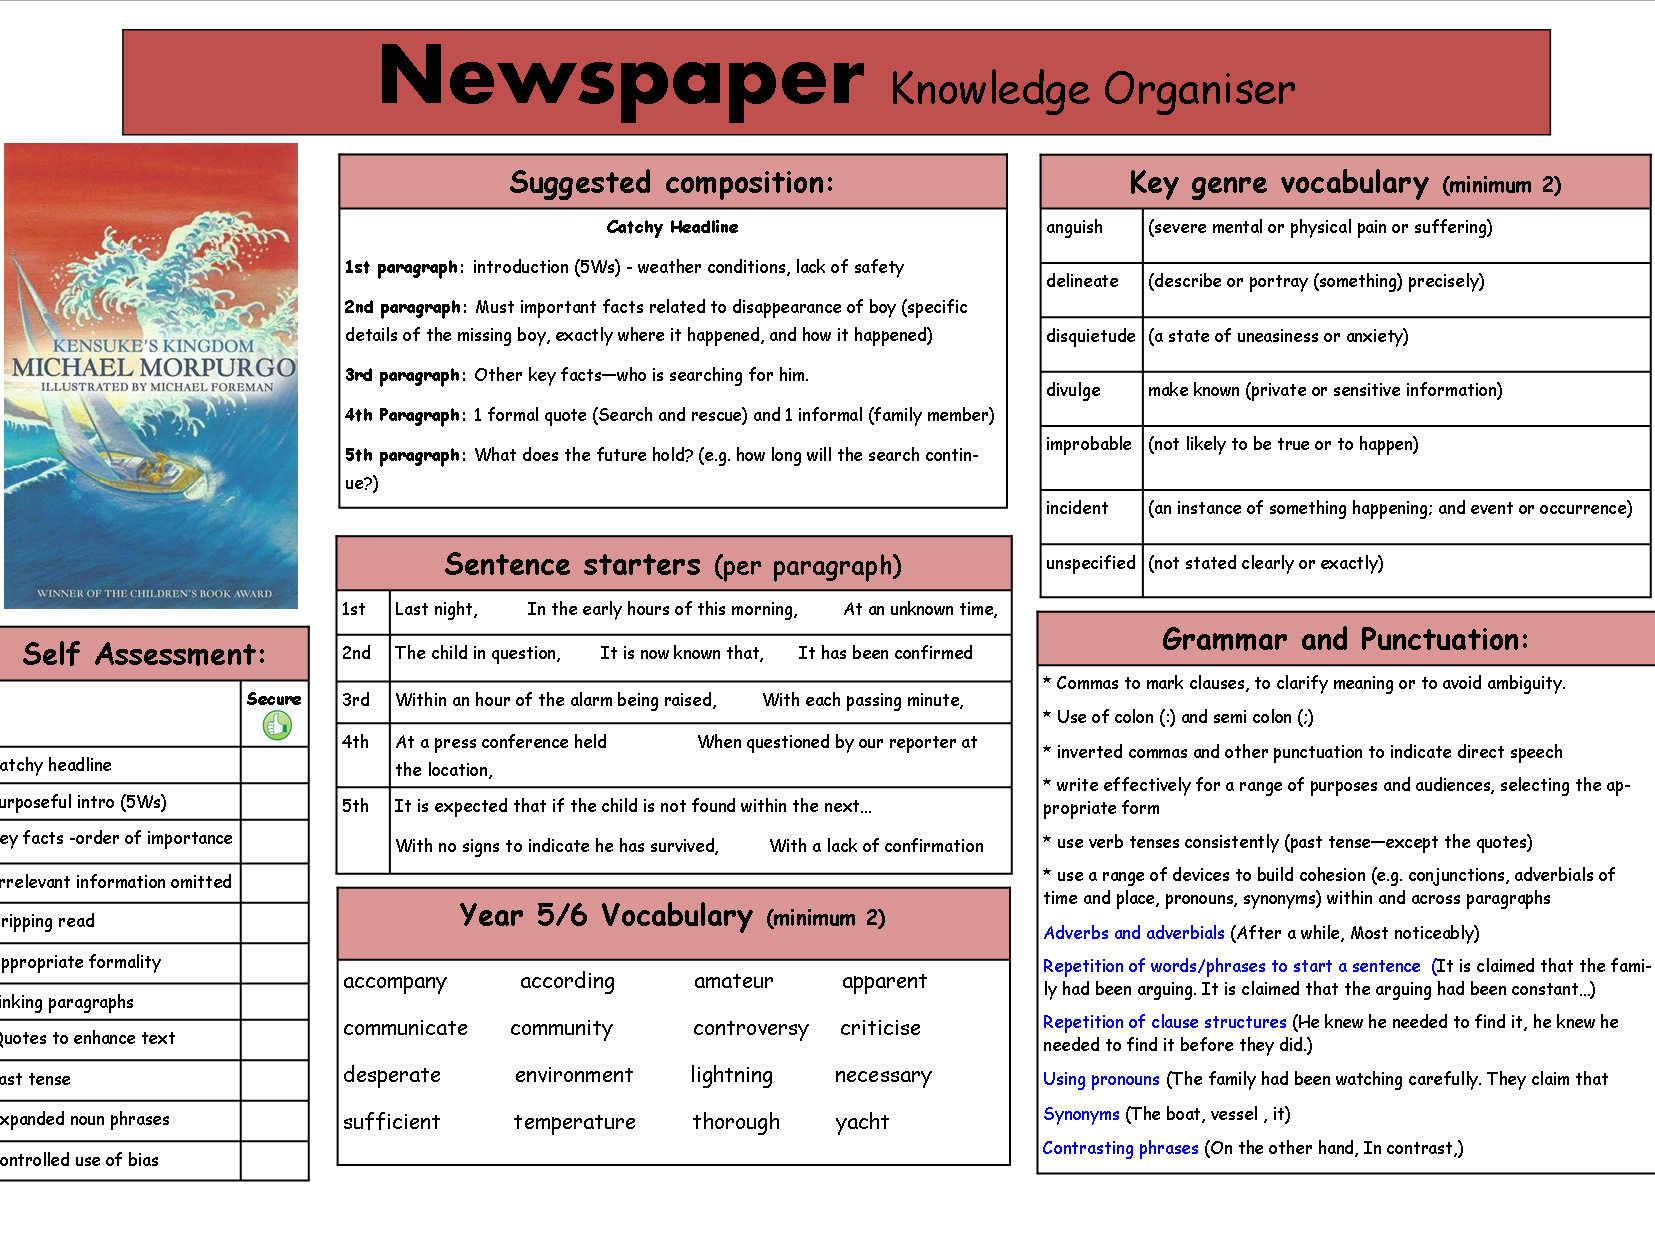 Newspaper Knowledge Organiser based on Kensuke's Kingdom